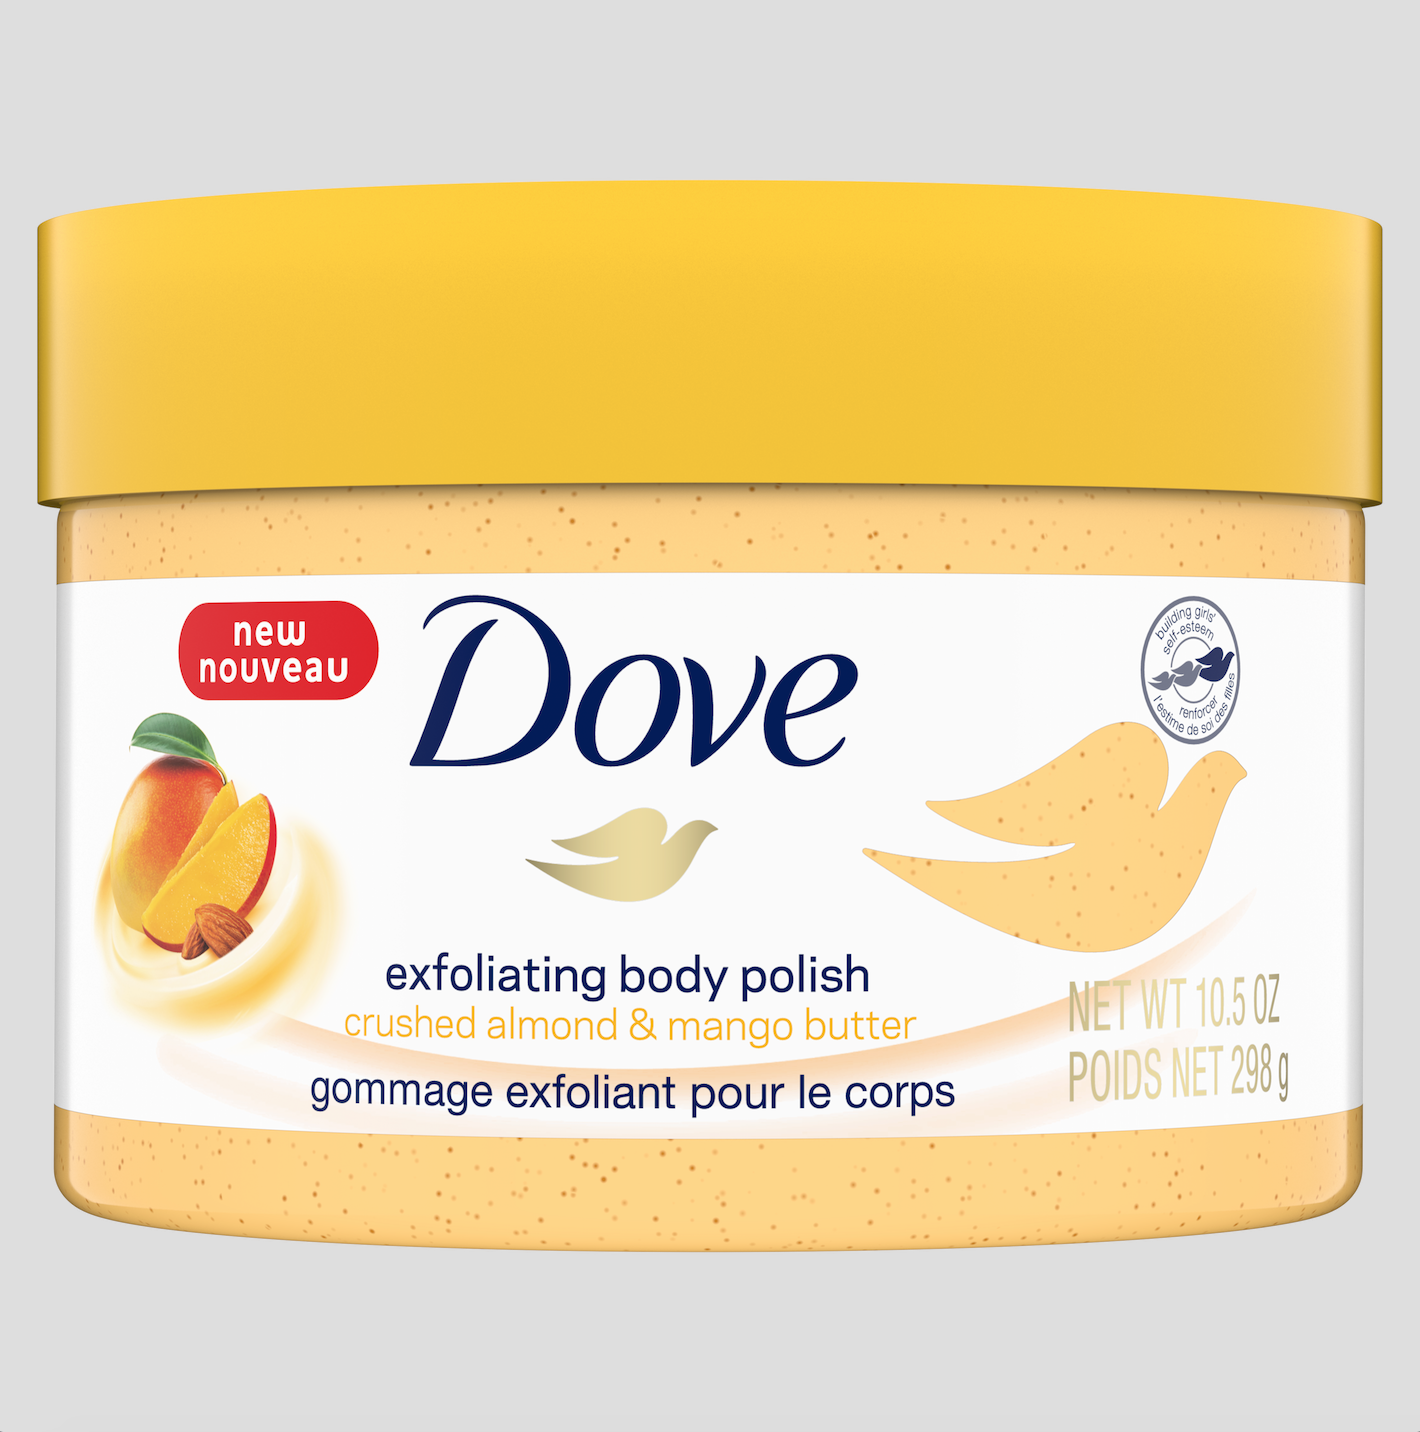 Dove body polish